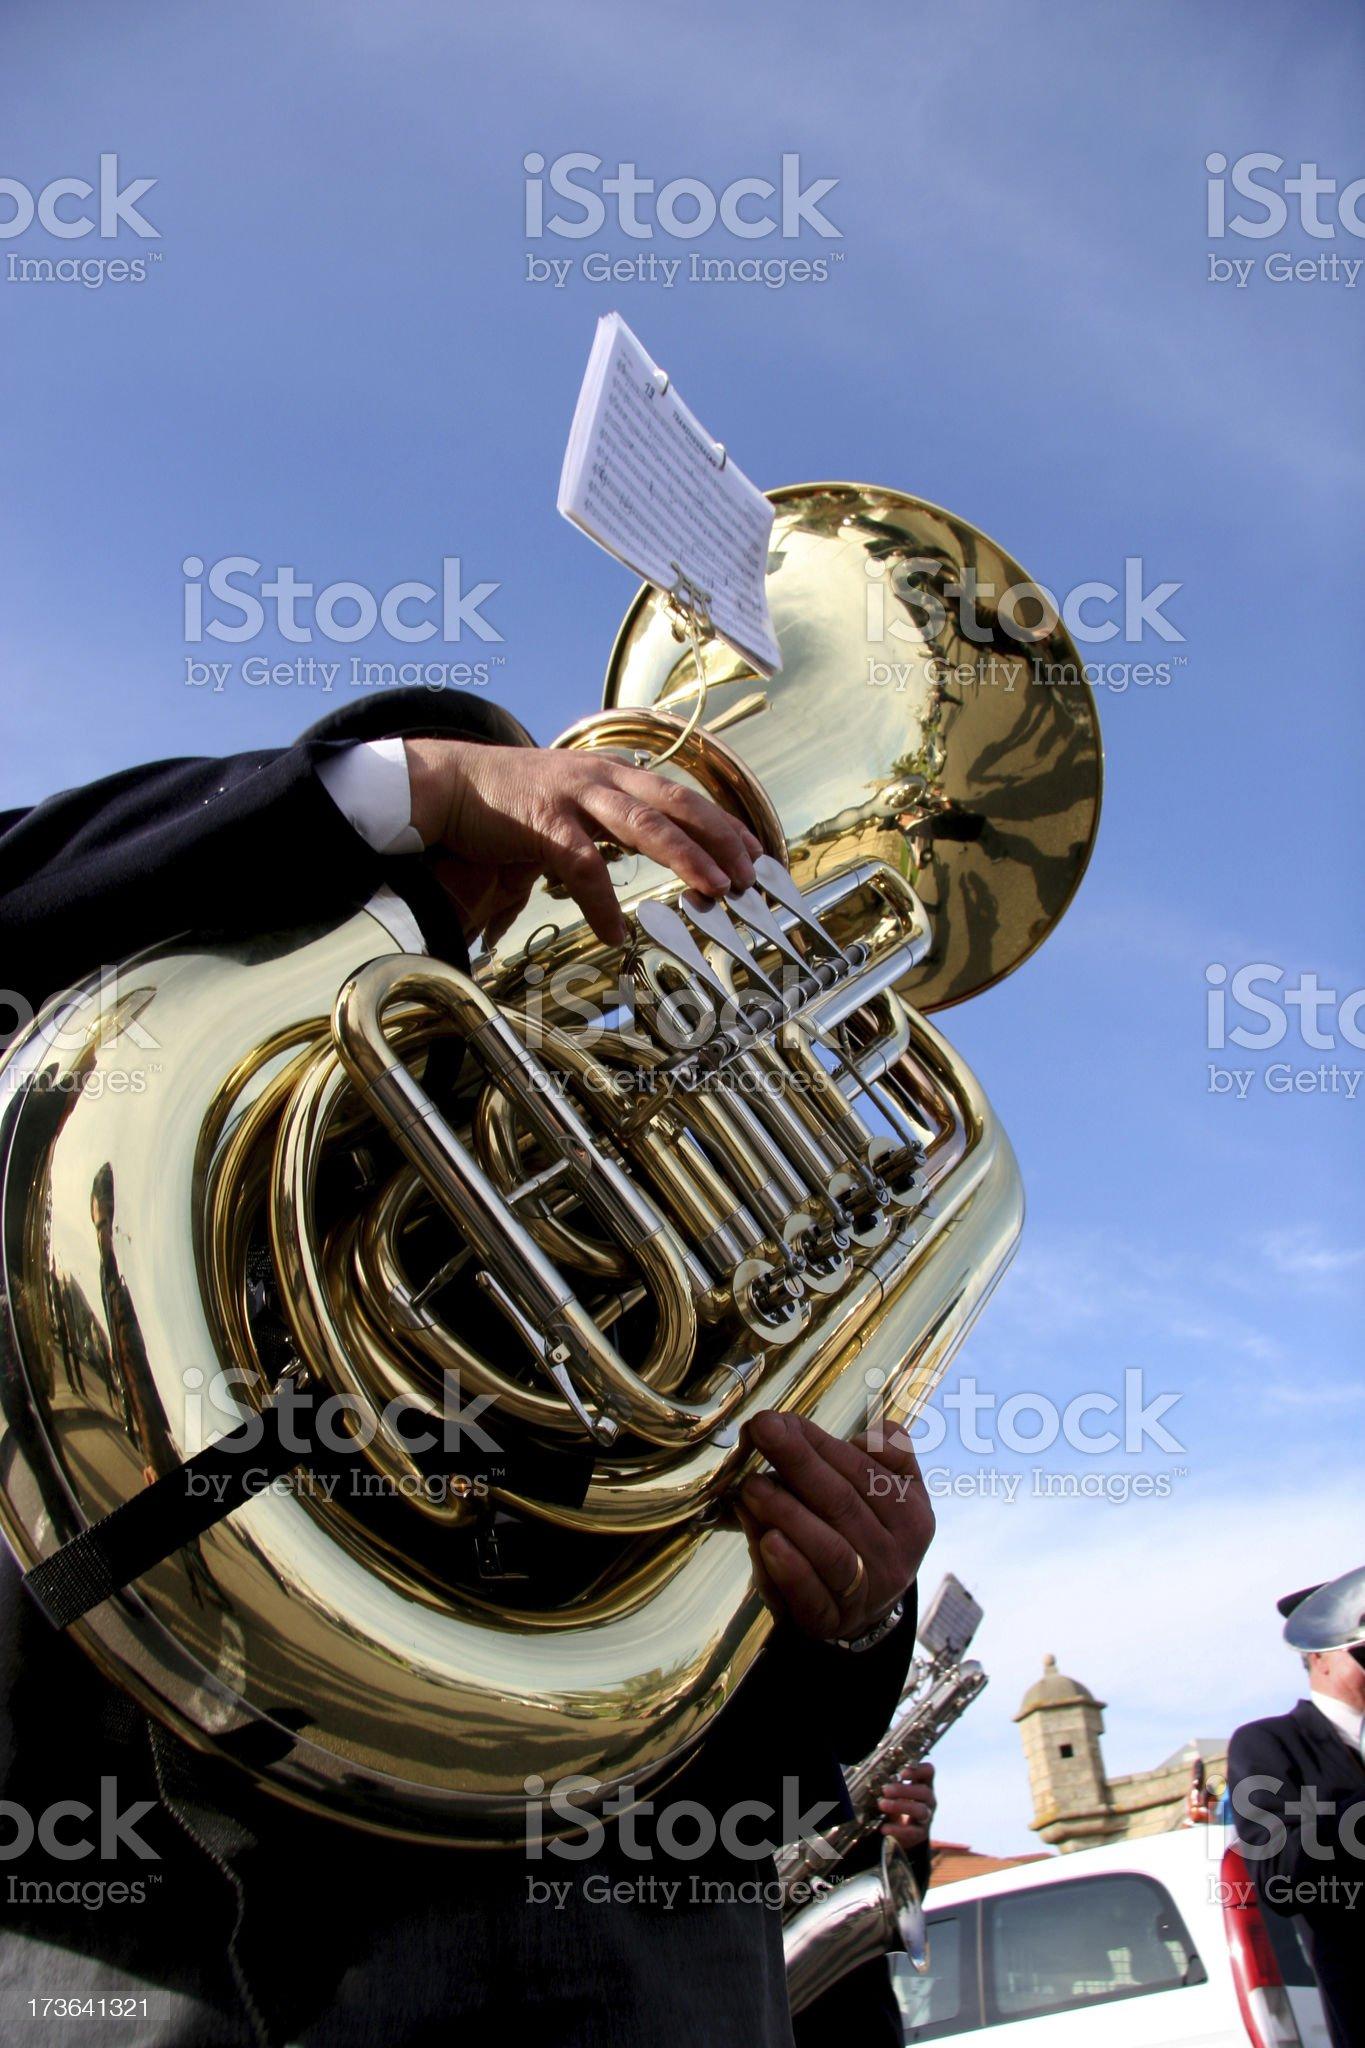 Performance royalty-free stock photo